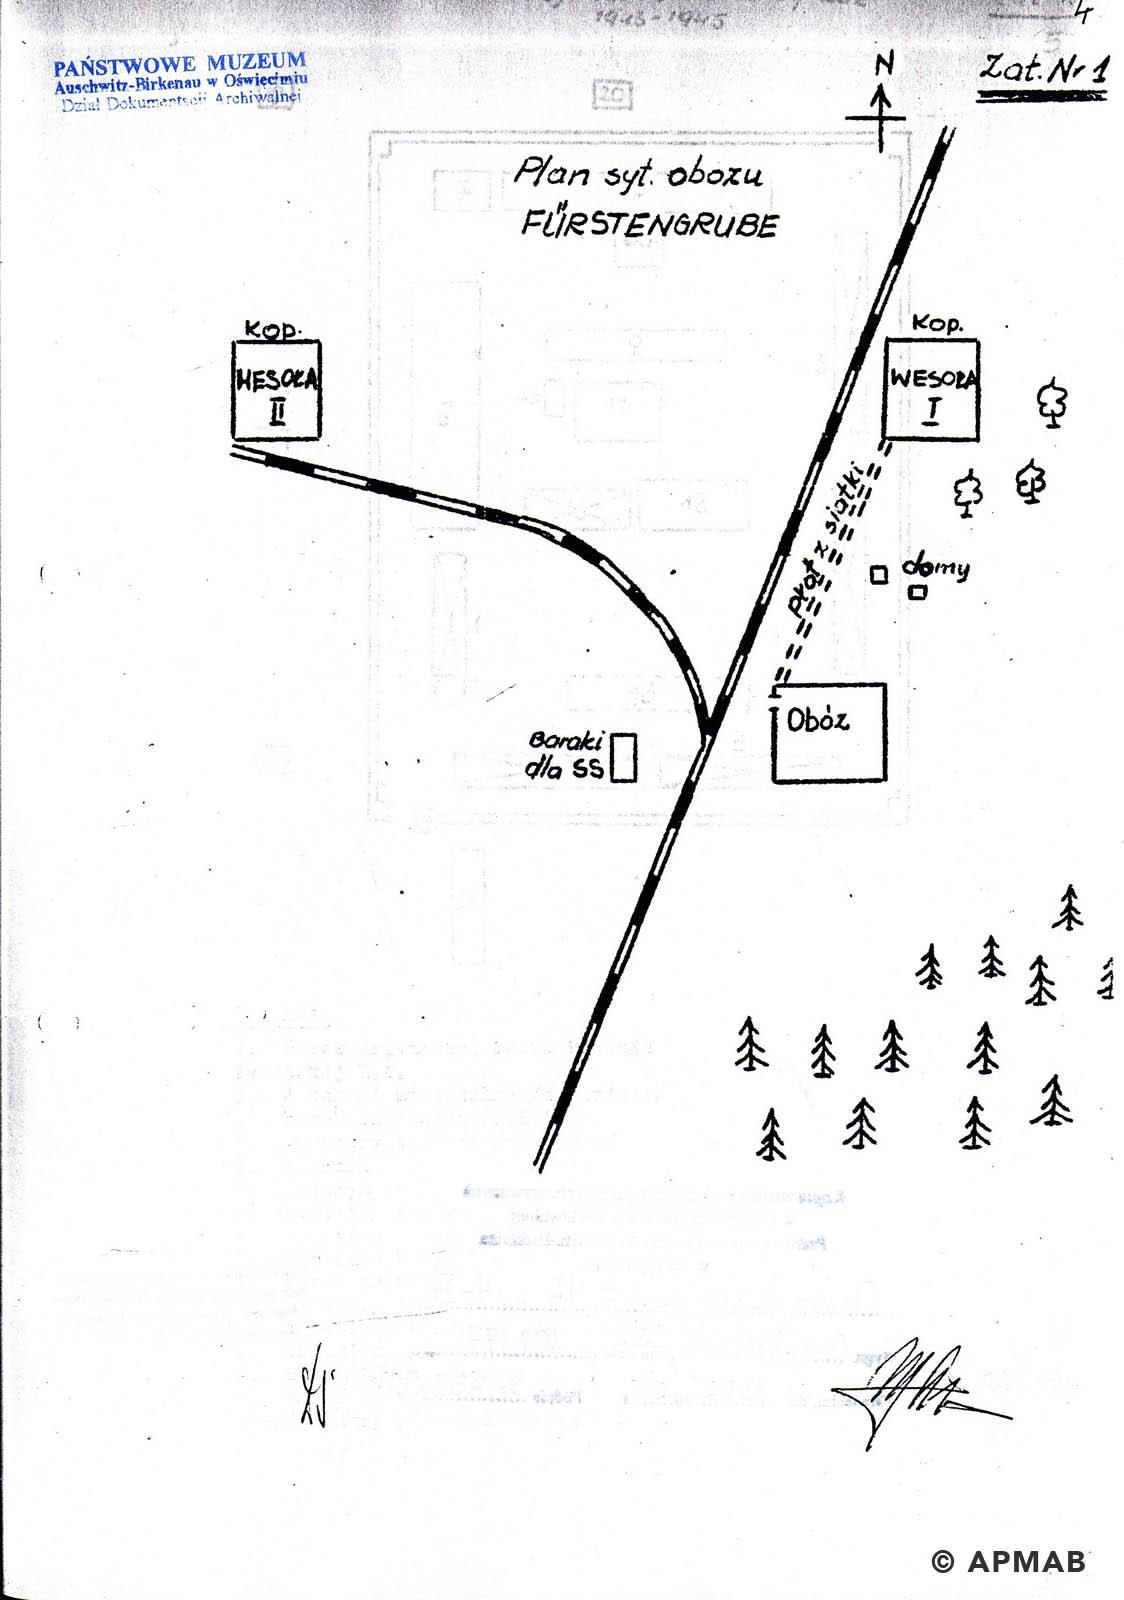 Former prisoner drawing of mine shafts in Wesola. APMAB